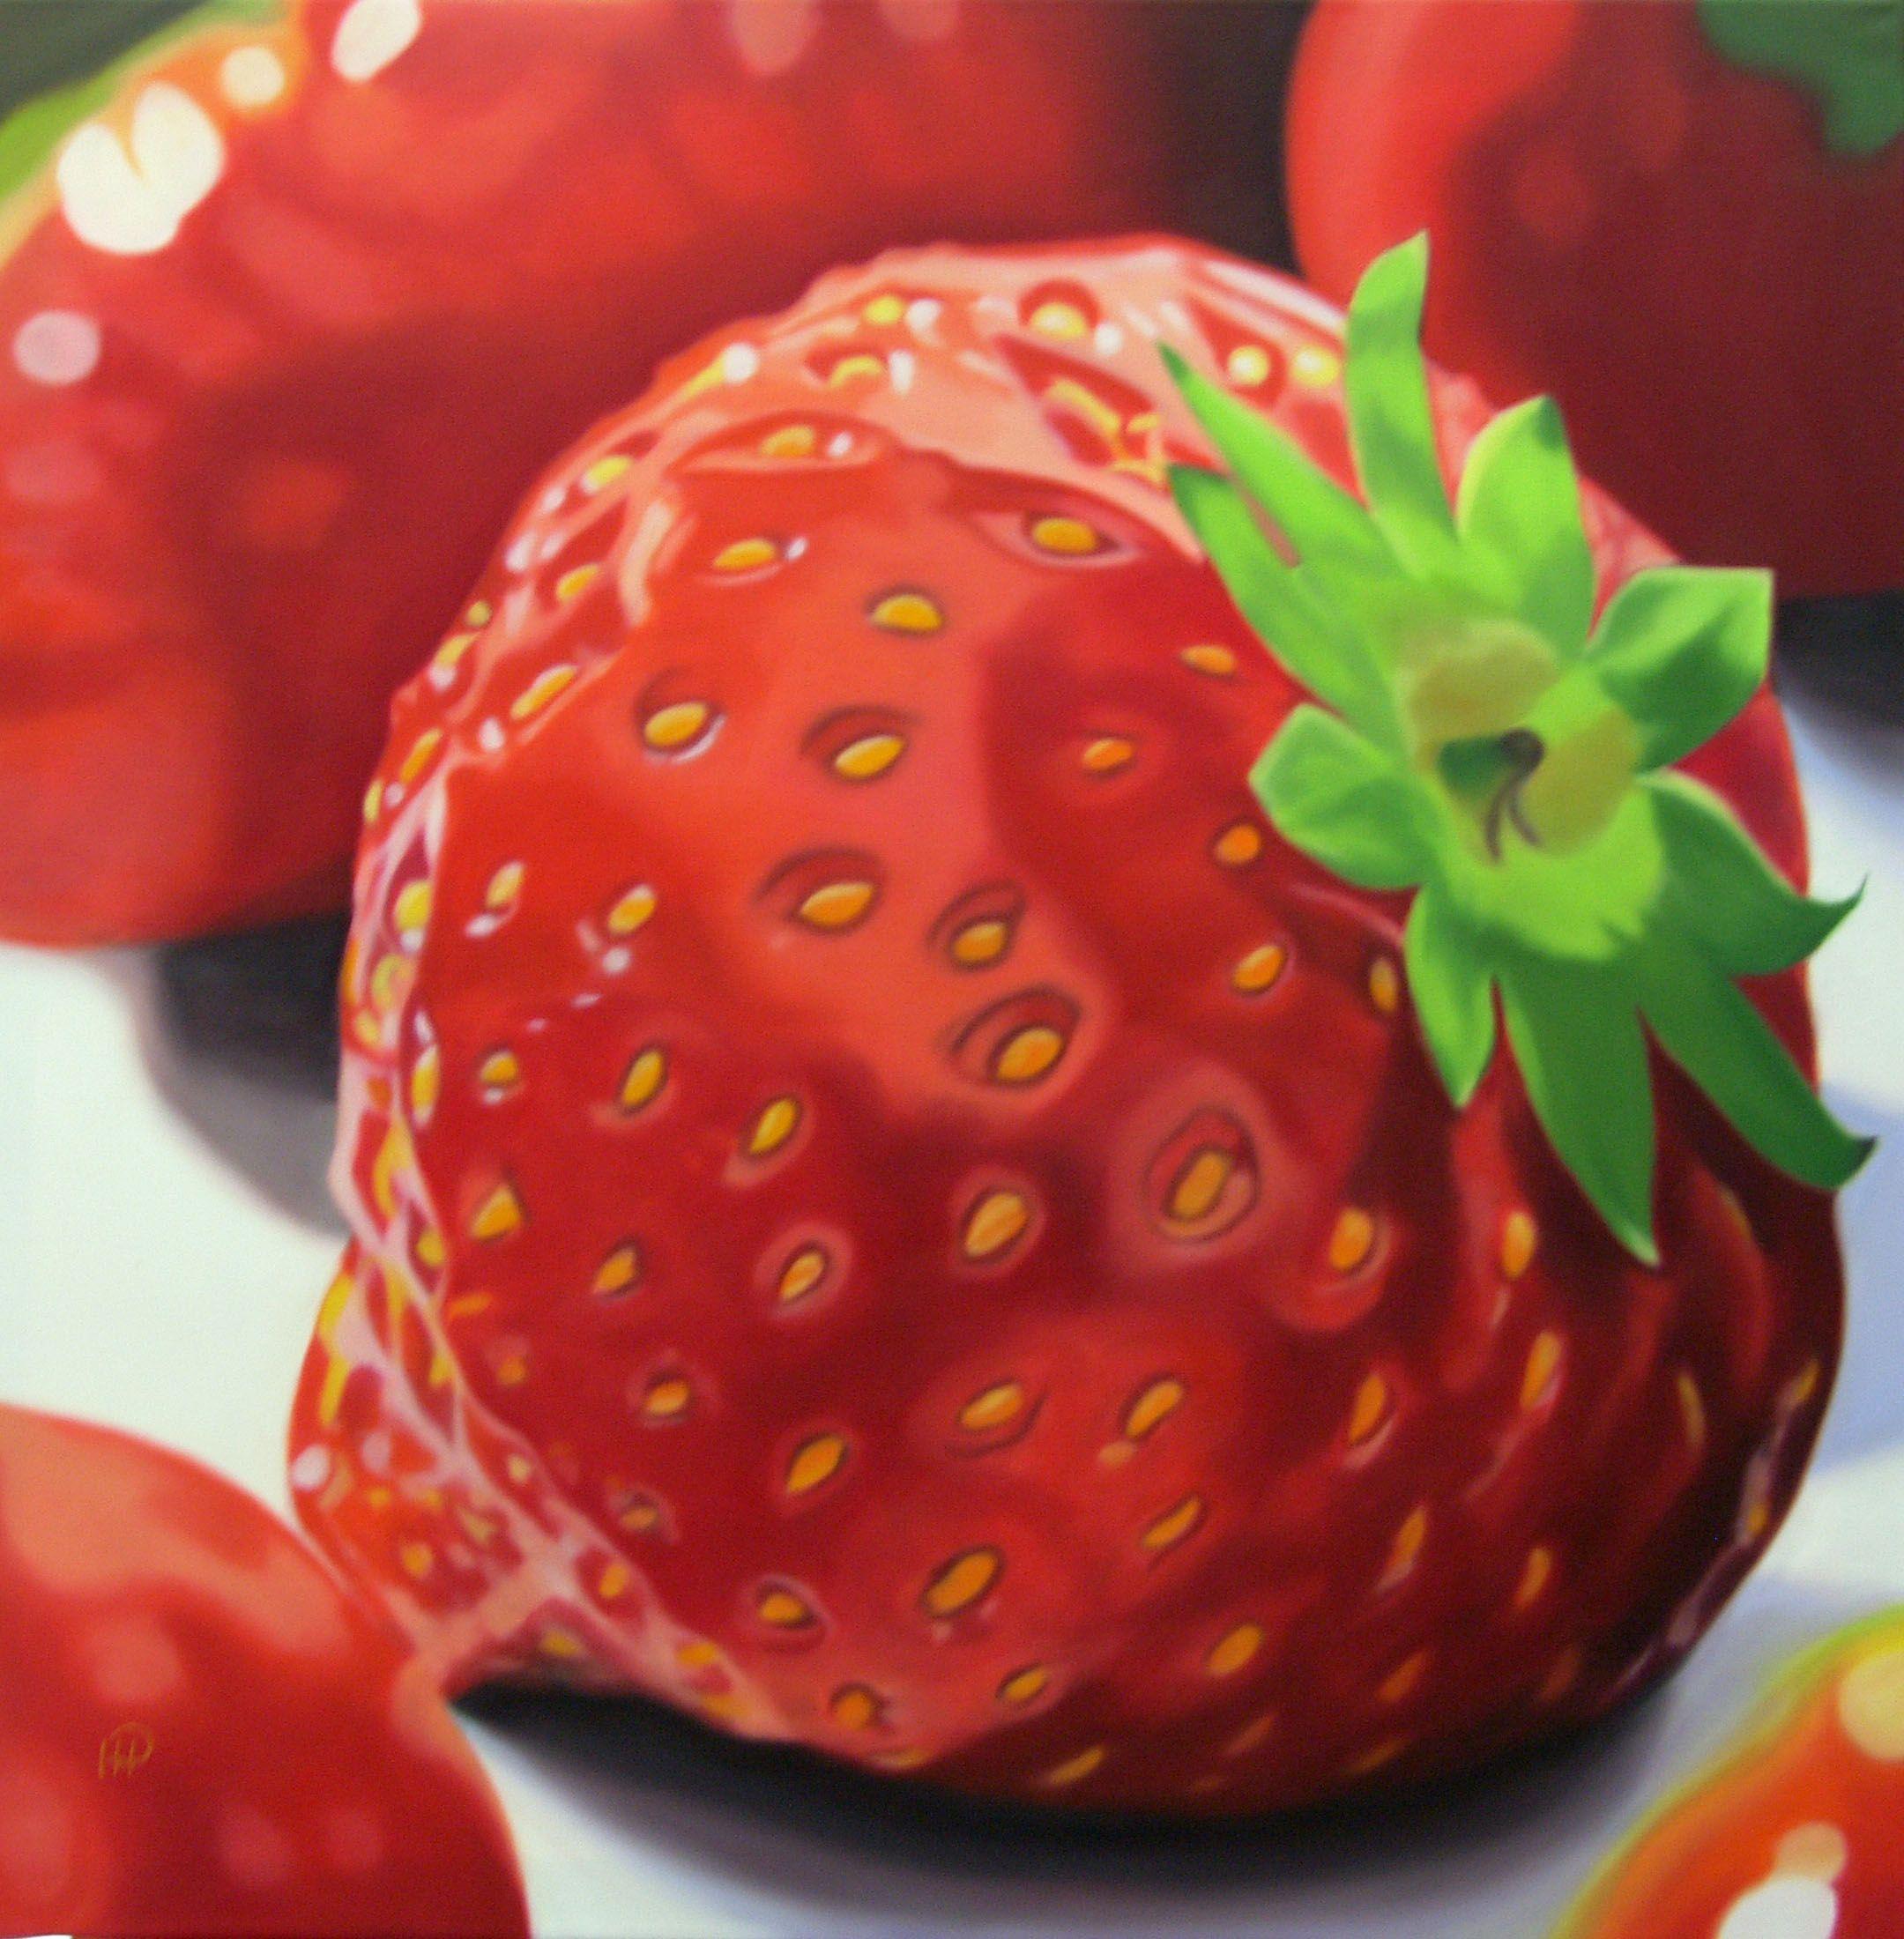 Palmisano - Erdbeere ++UNIKAT++